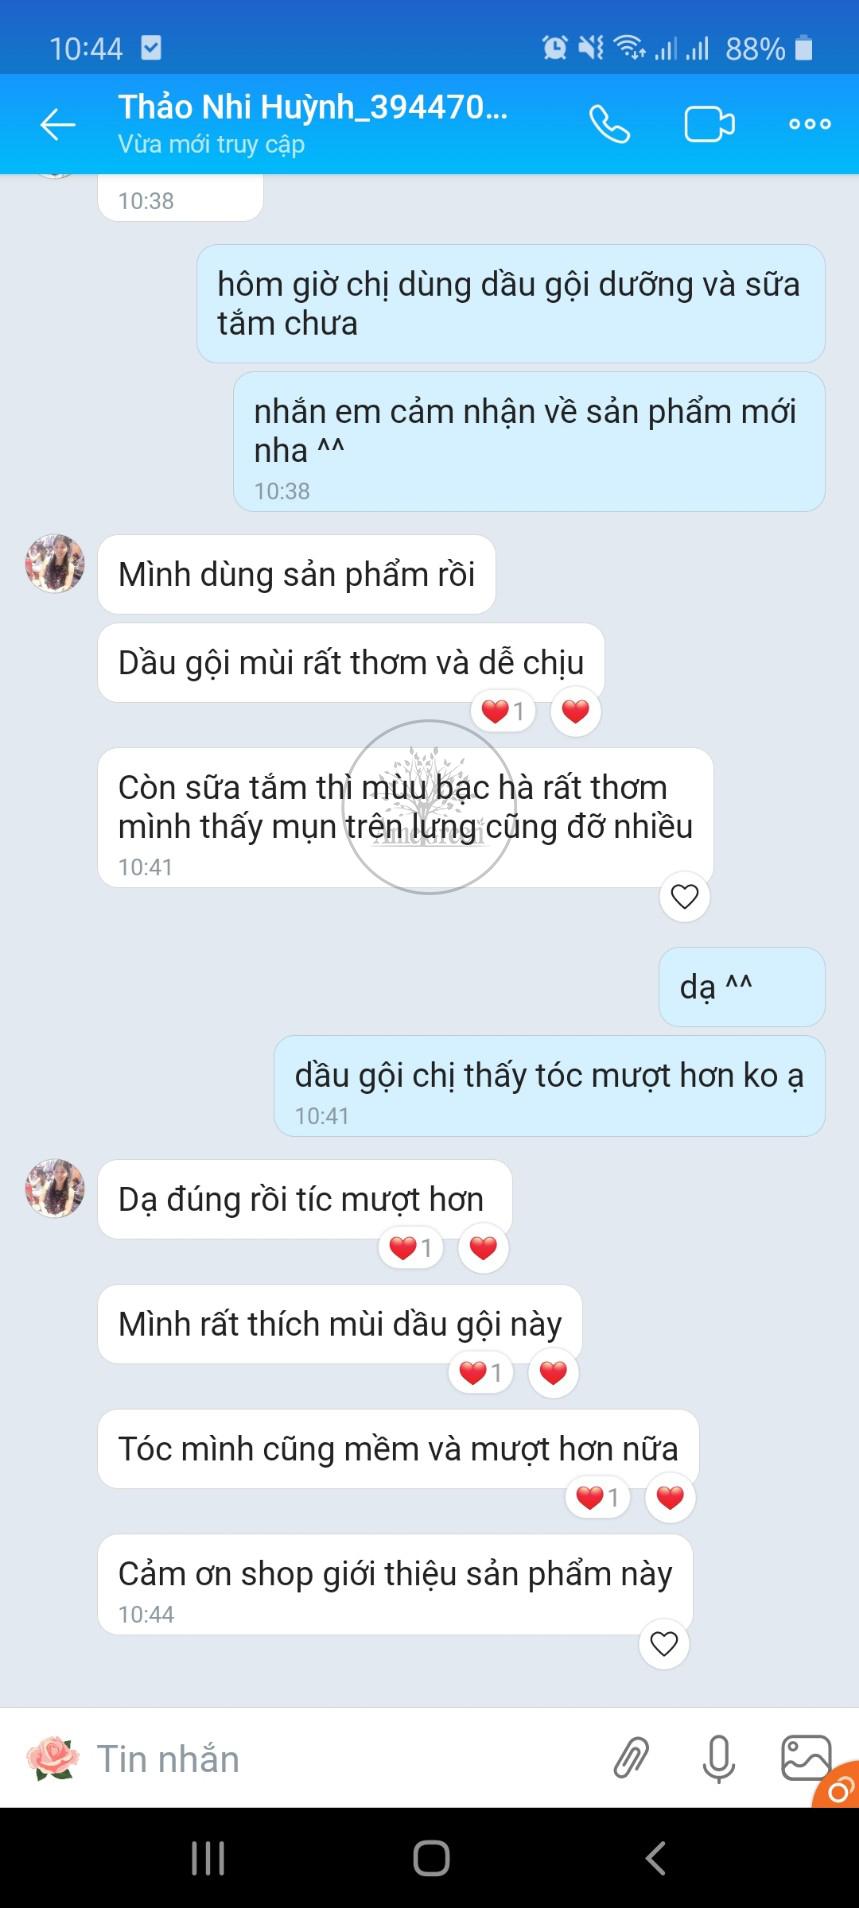 Thao-nhi-review-dau-goi-buoi-tri-rung-toc-amegreen